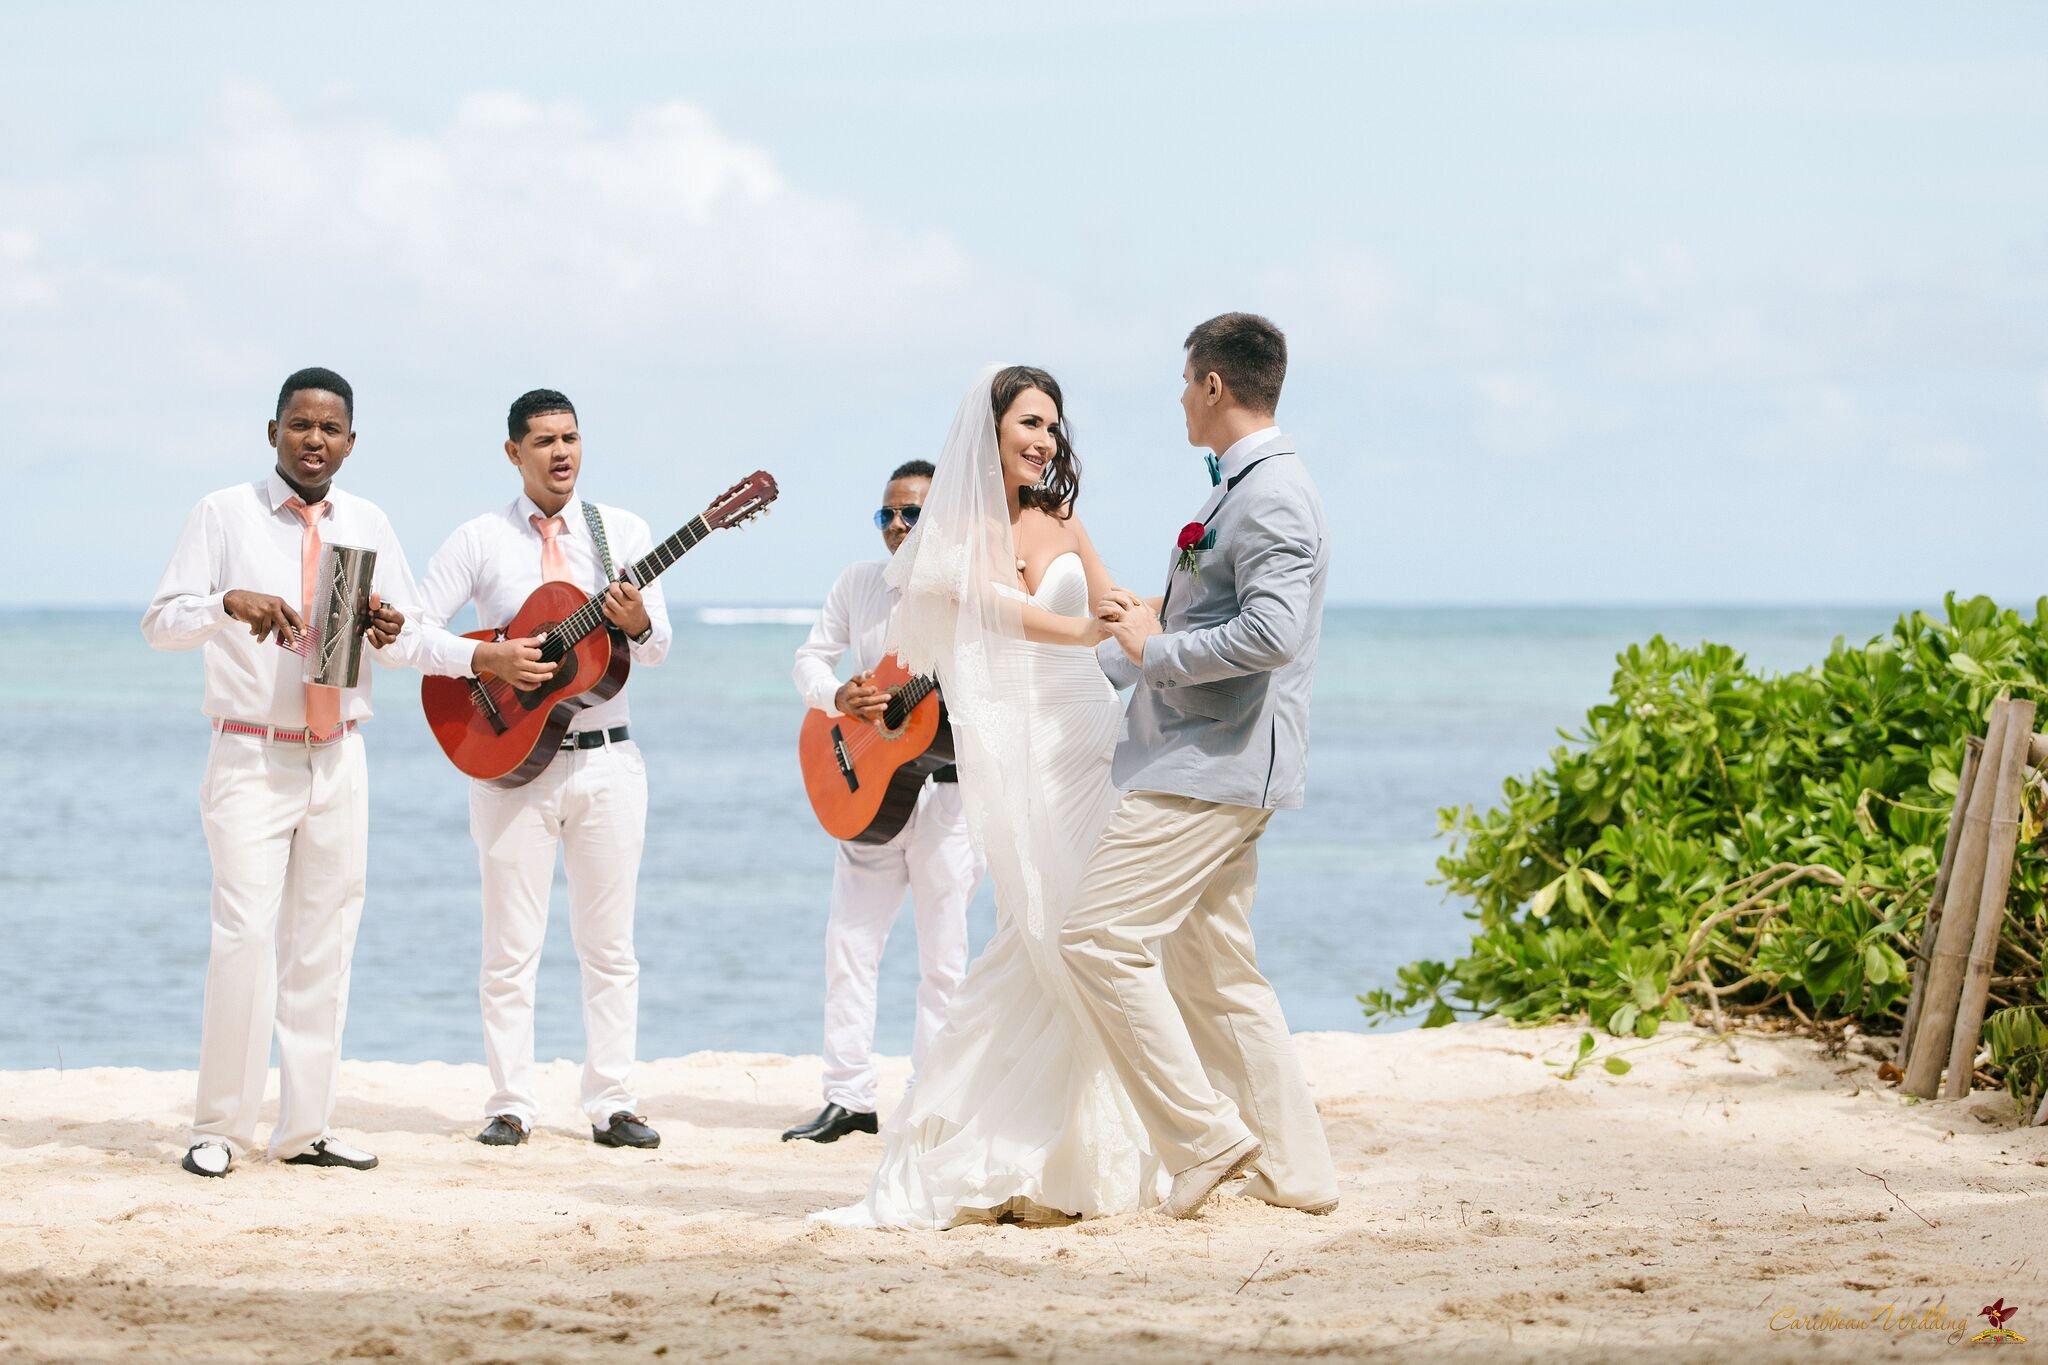 Caribbean Wedding: VIP Ceremony On Colibri Beach. Weddings In The Dominican